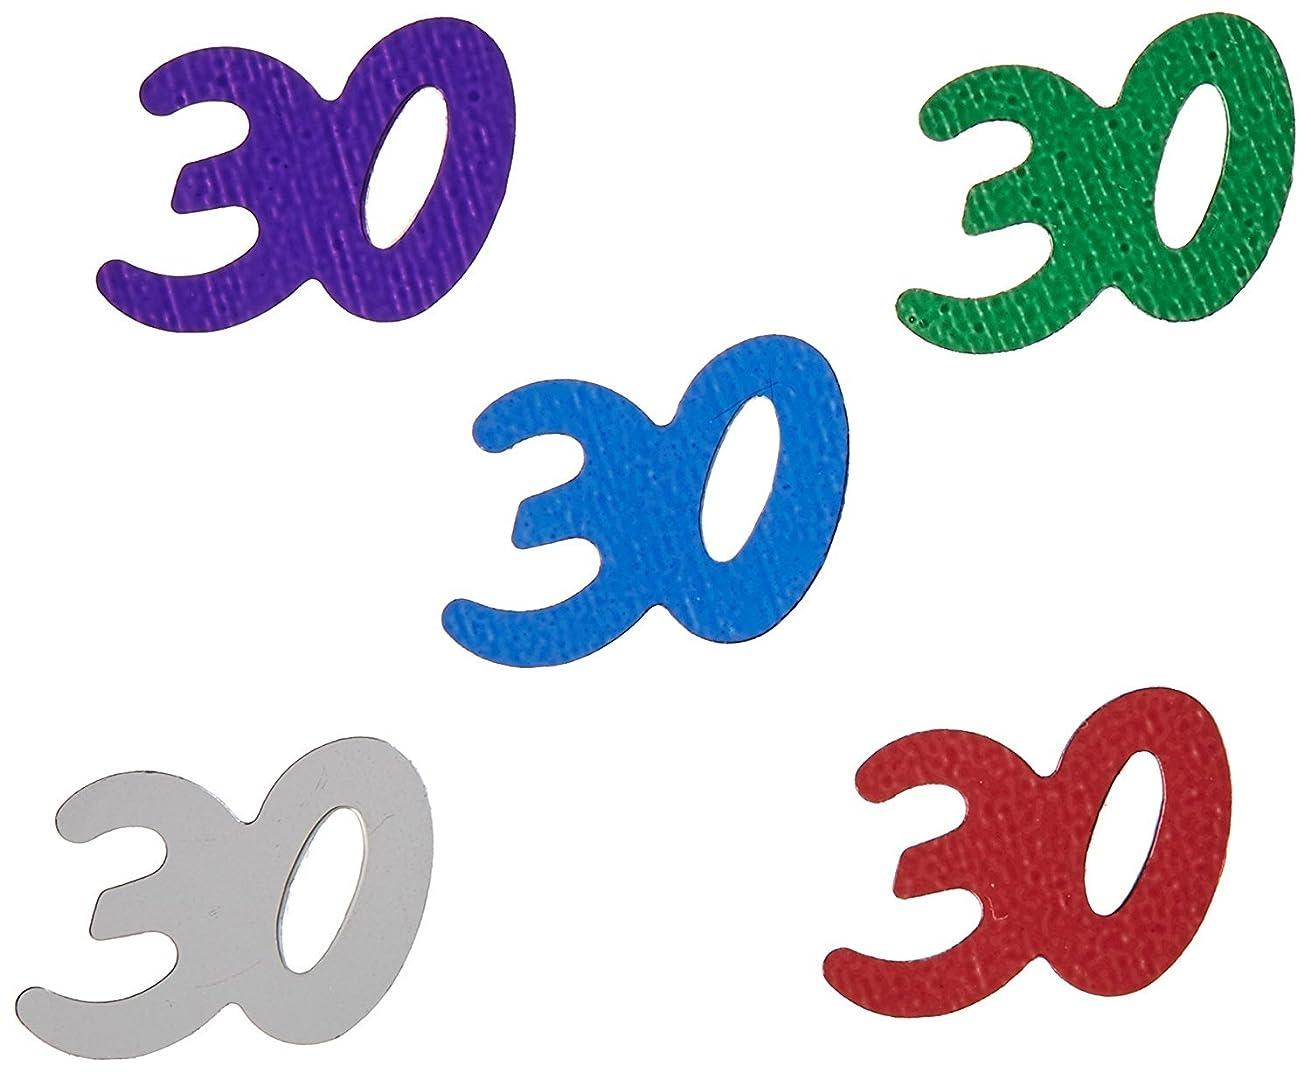 Fanci-Fetti 30 Silhouettes (multi-color) Party Accessory (3-Pack)